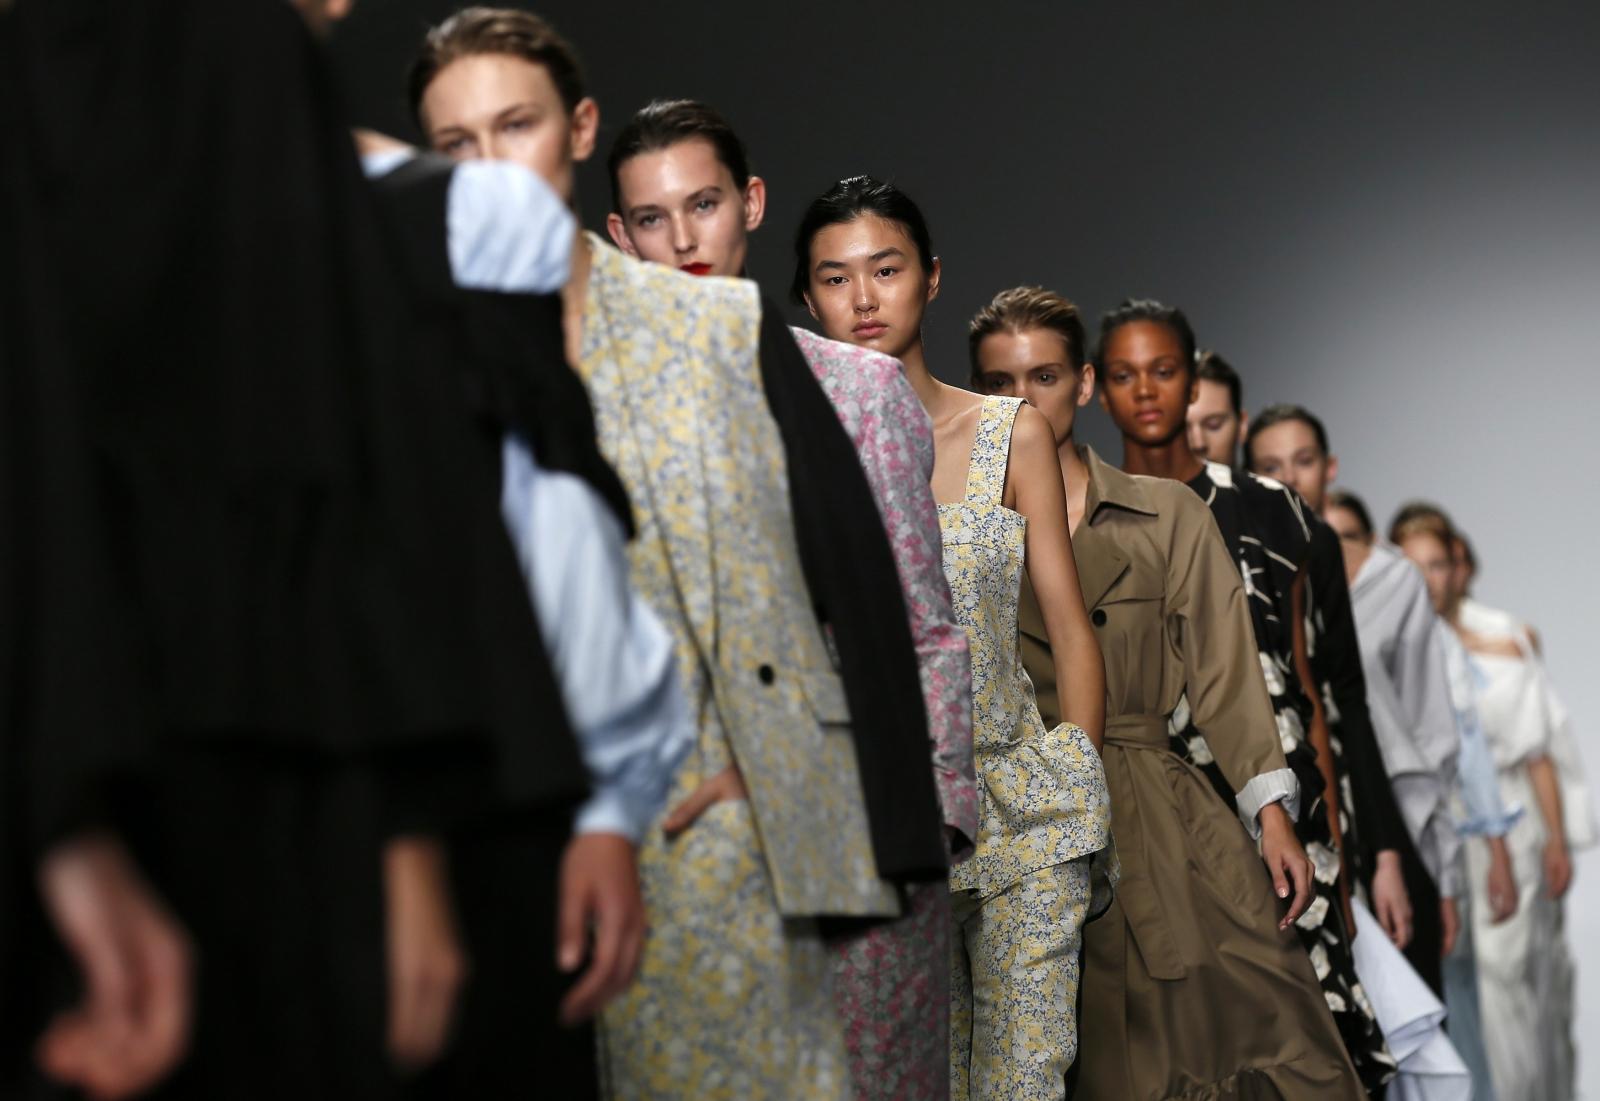 London Fashion Week - Day 1 - 08